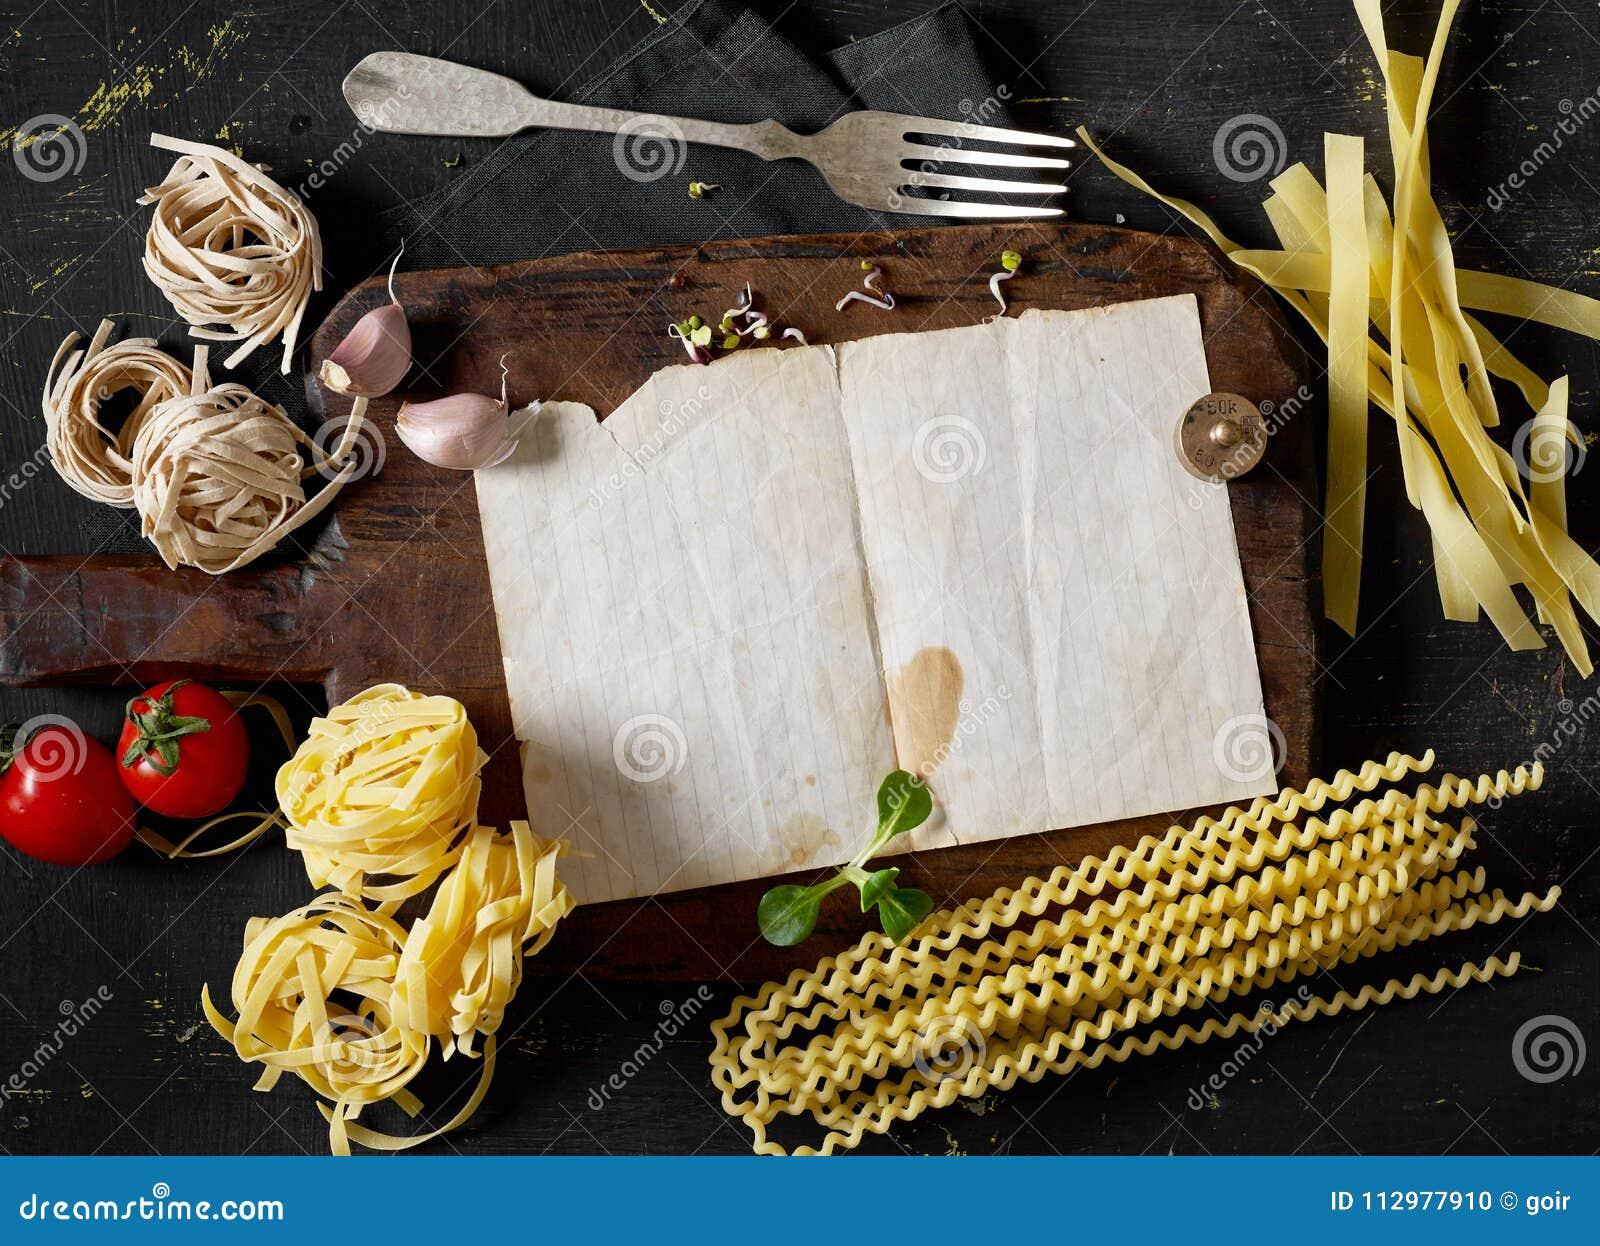 Cooking pasta receipe